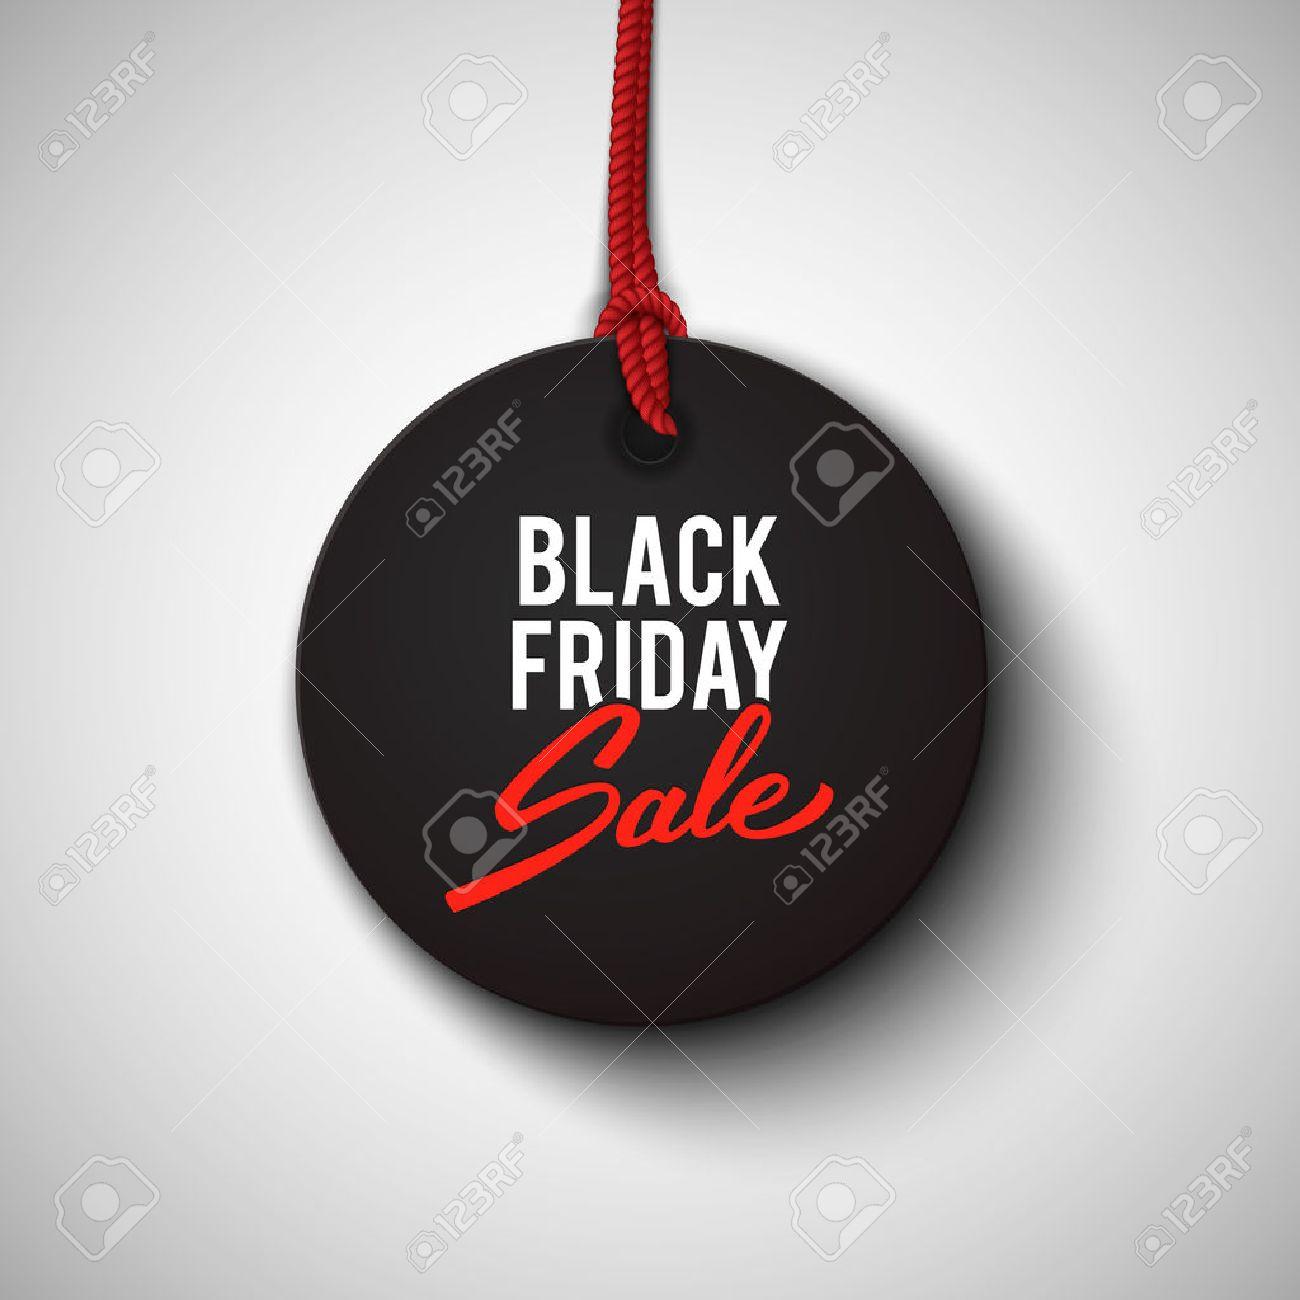 Black Friday sale black tag, round banner, advertising, vector illustration - 43948418